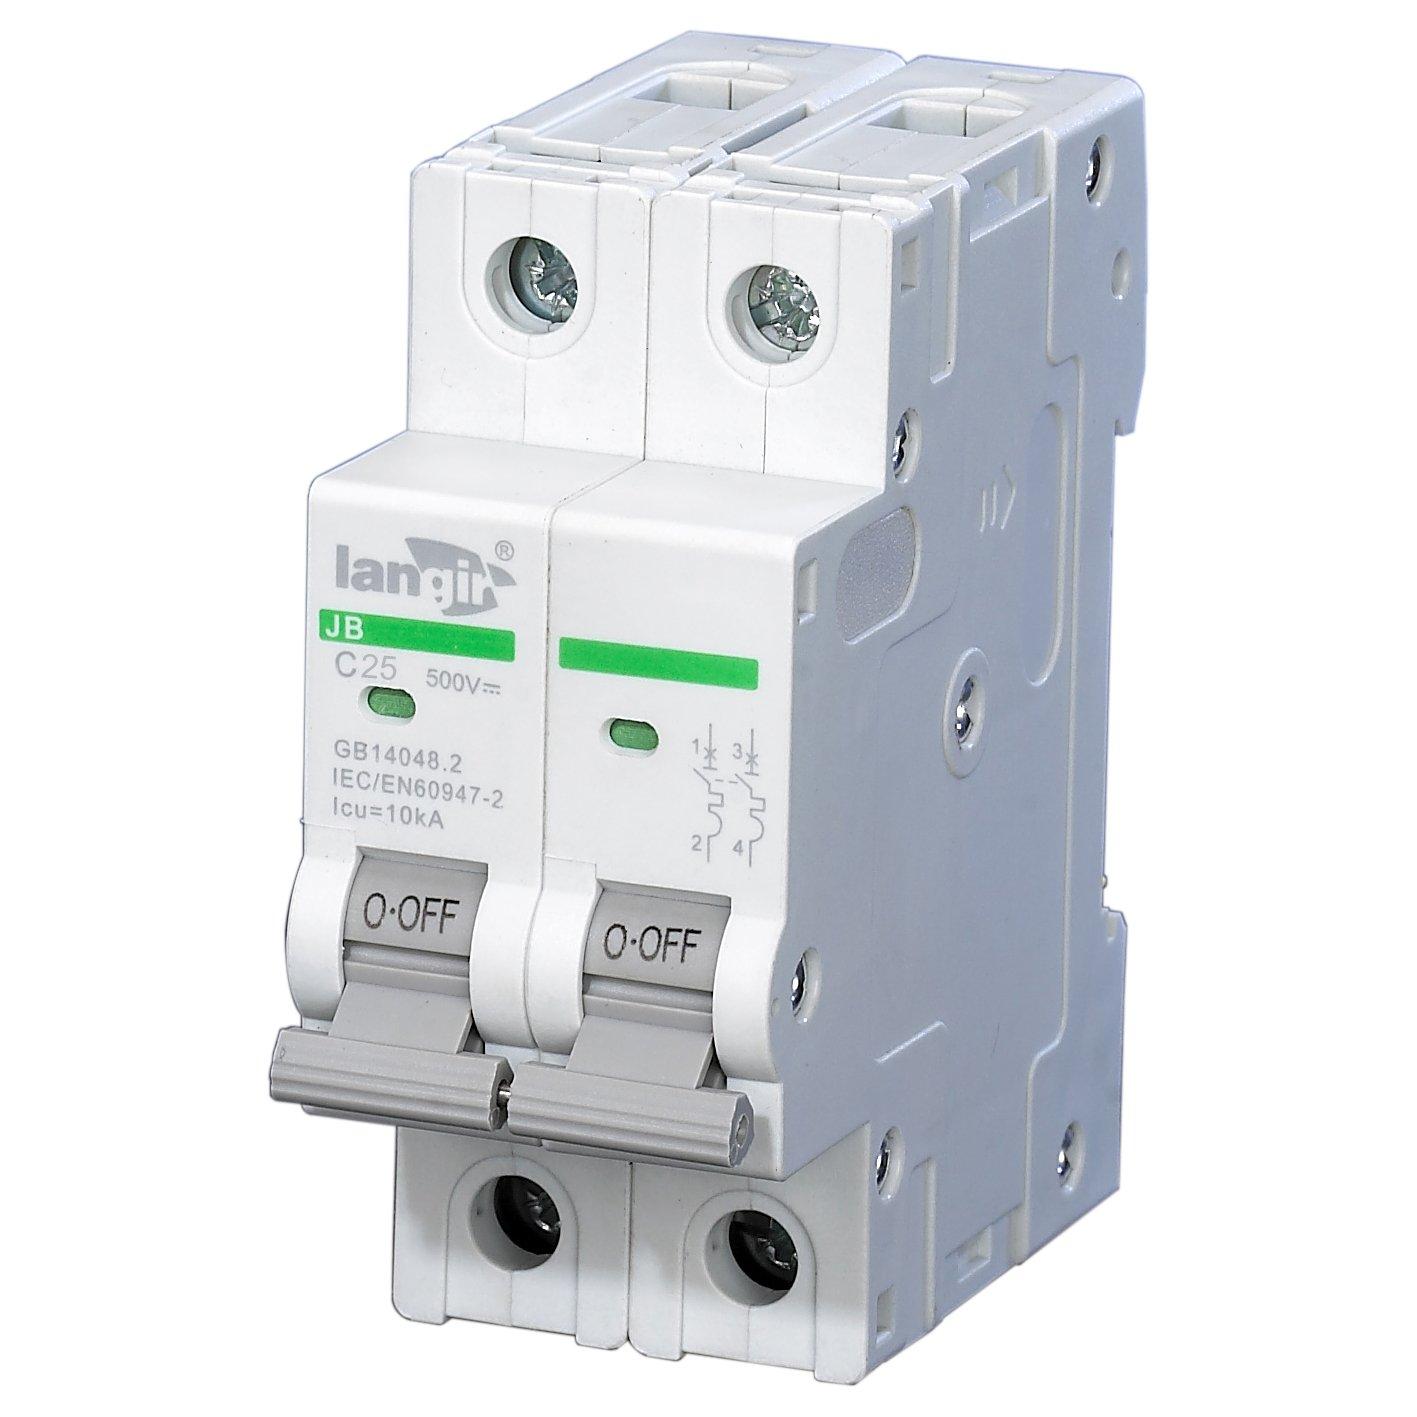 langir 25 A 500 V 2 Pole Energí a Solar Fotovoltaica de montaje en panel DC interruptor de circuito interruptor C curva con TUV Certificados LANGIR Electric Co. Ltd.